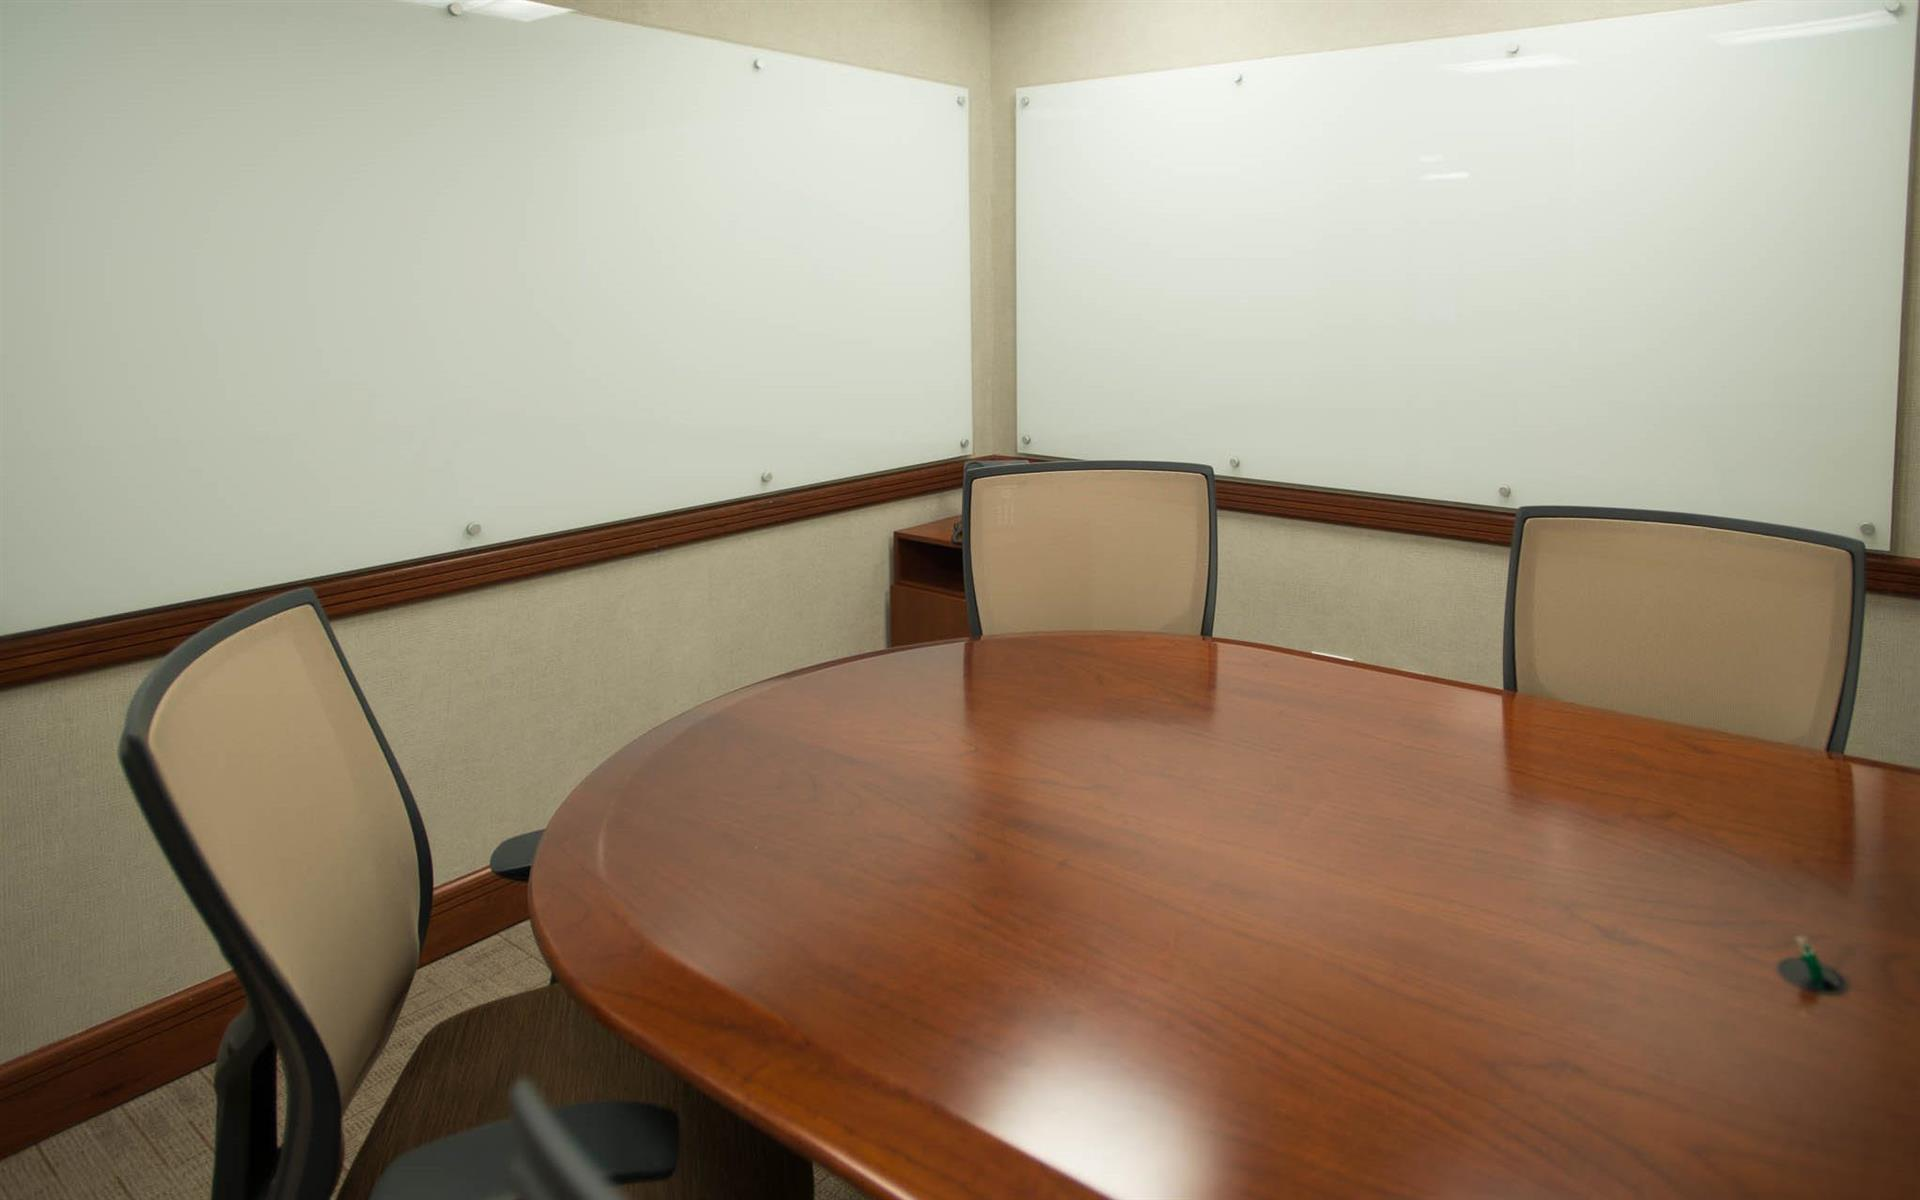 Symphony Workplaces -Westport CT - The Brainstorming Room